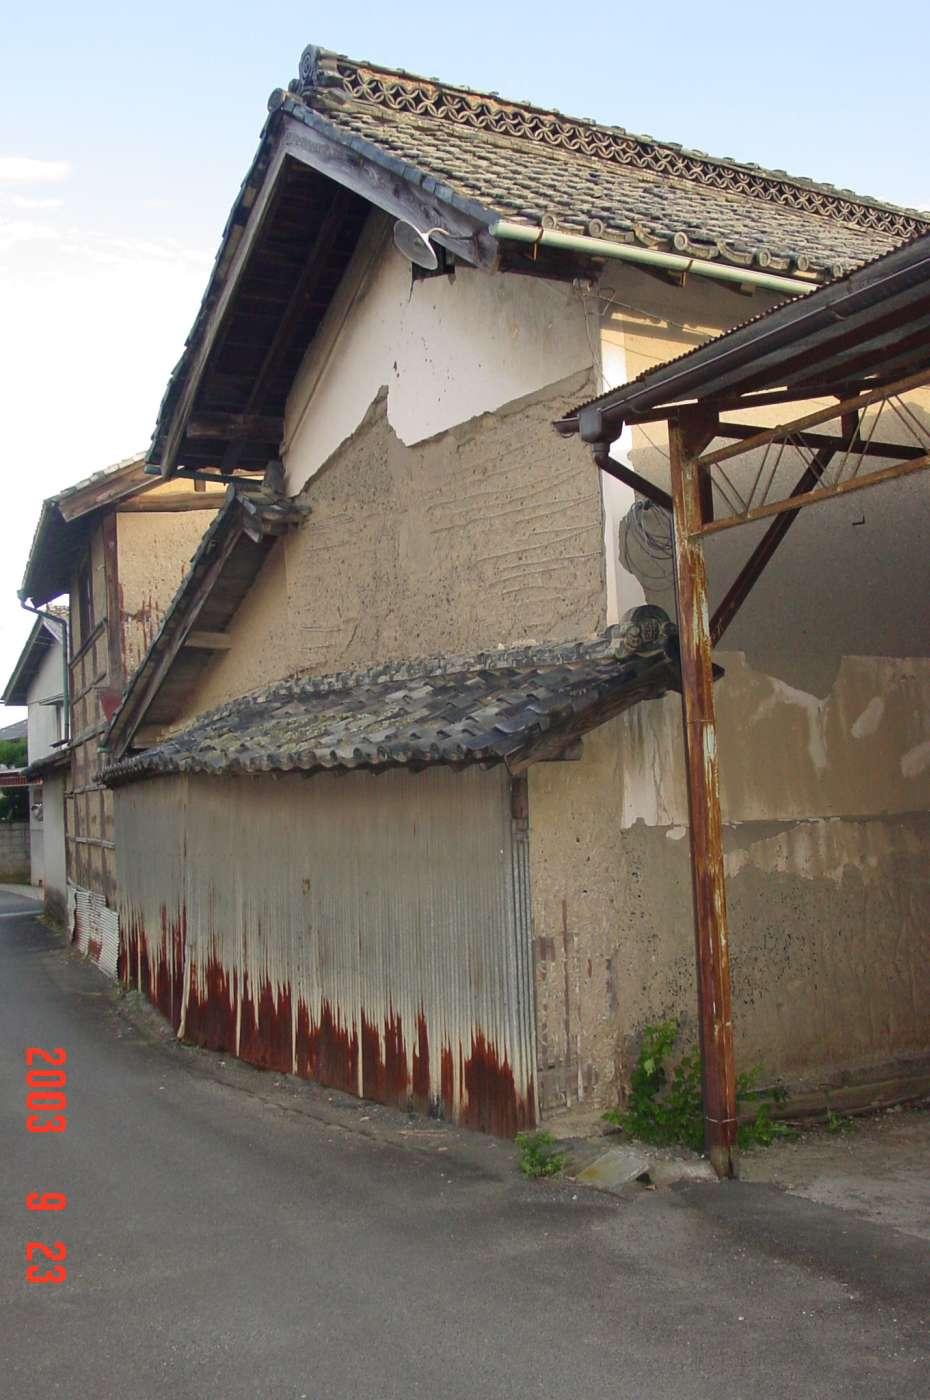 http://sumainomatsuki.com/folder1/DSC01814.JPG